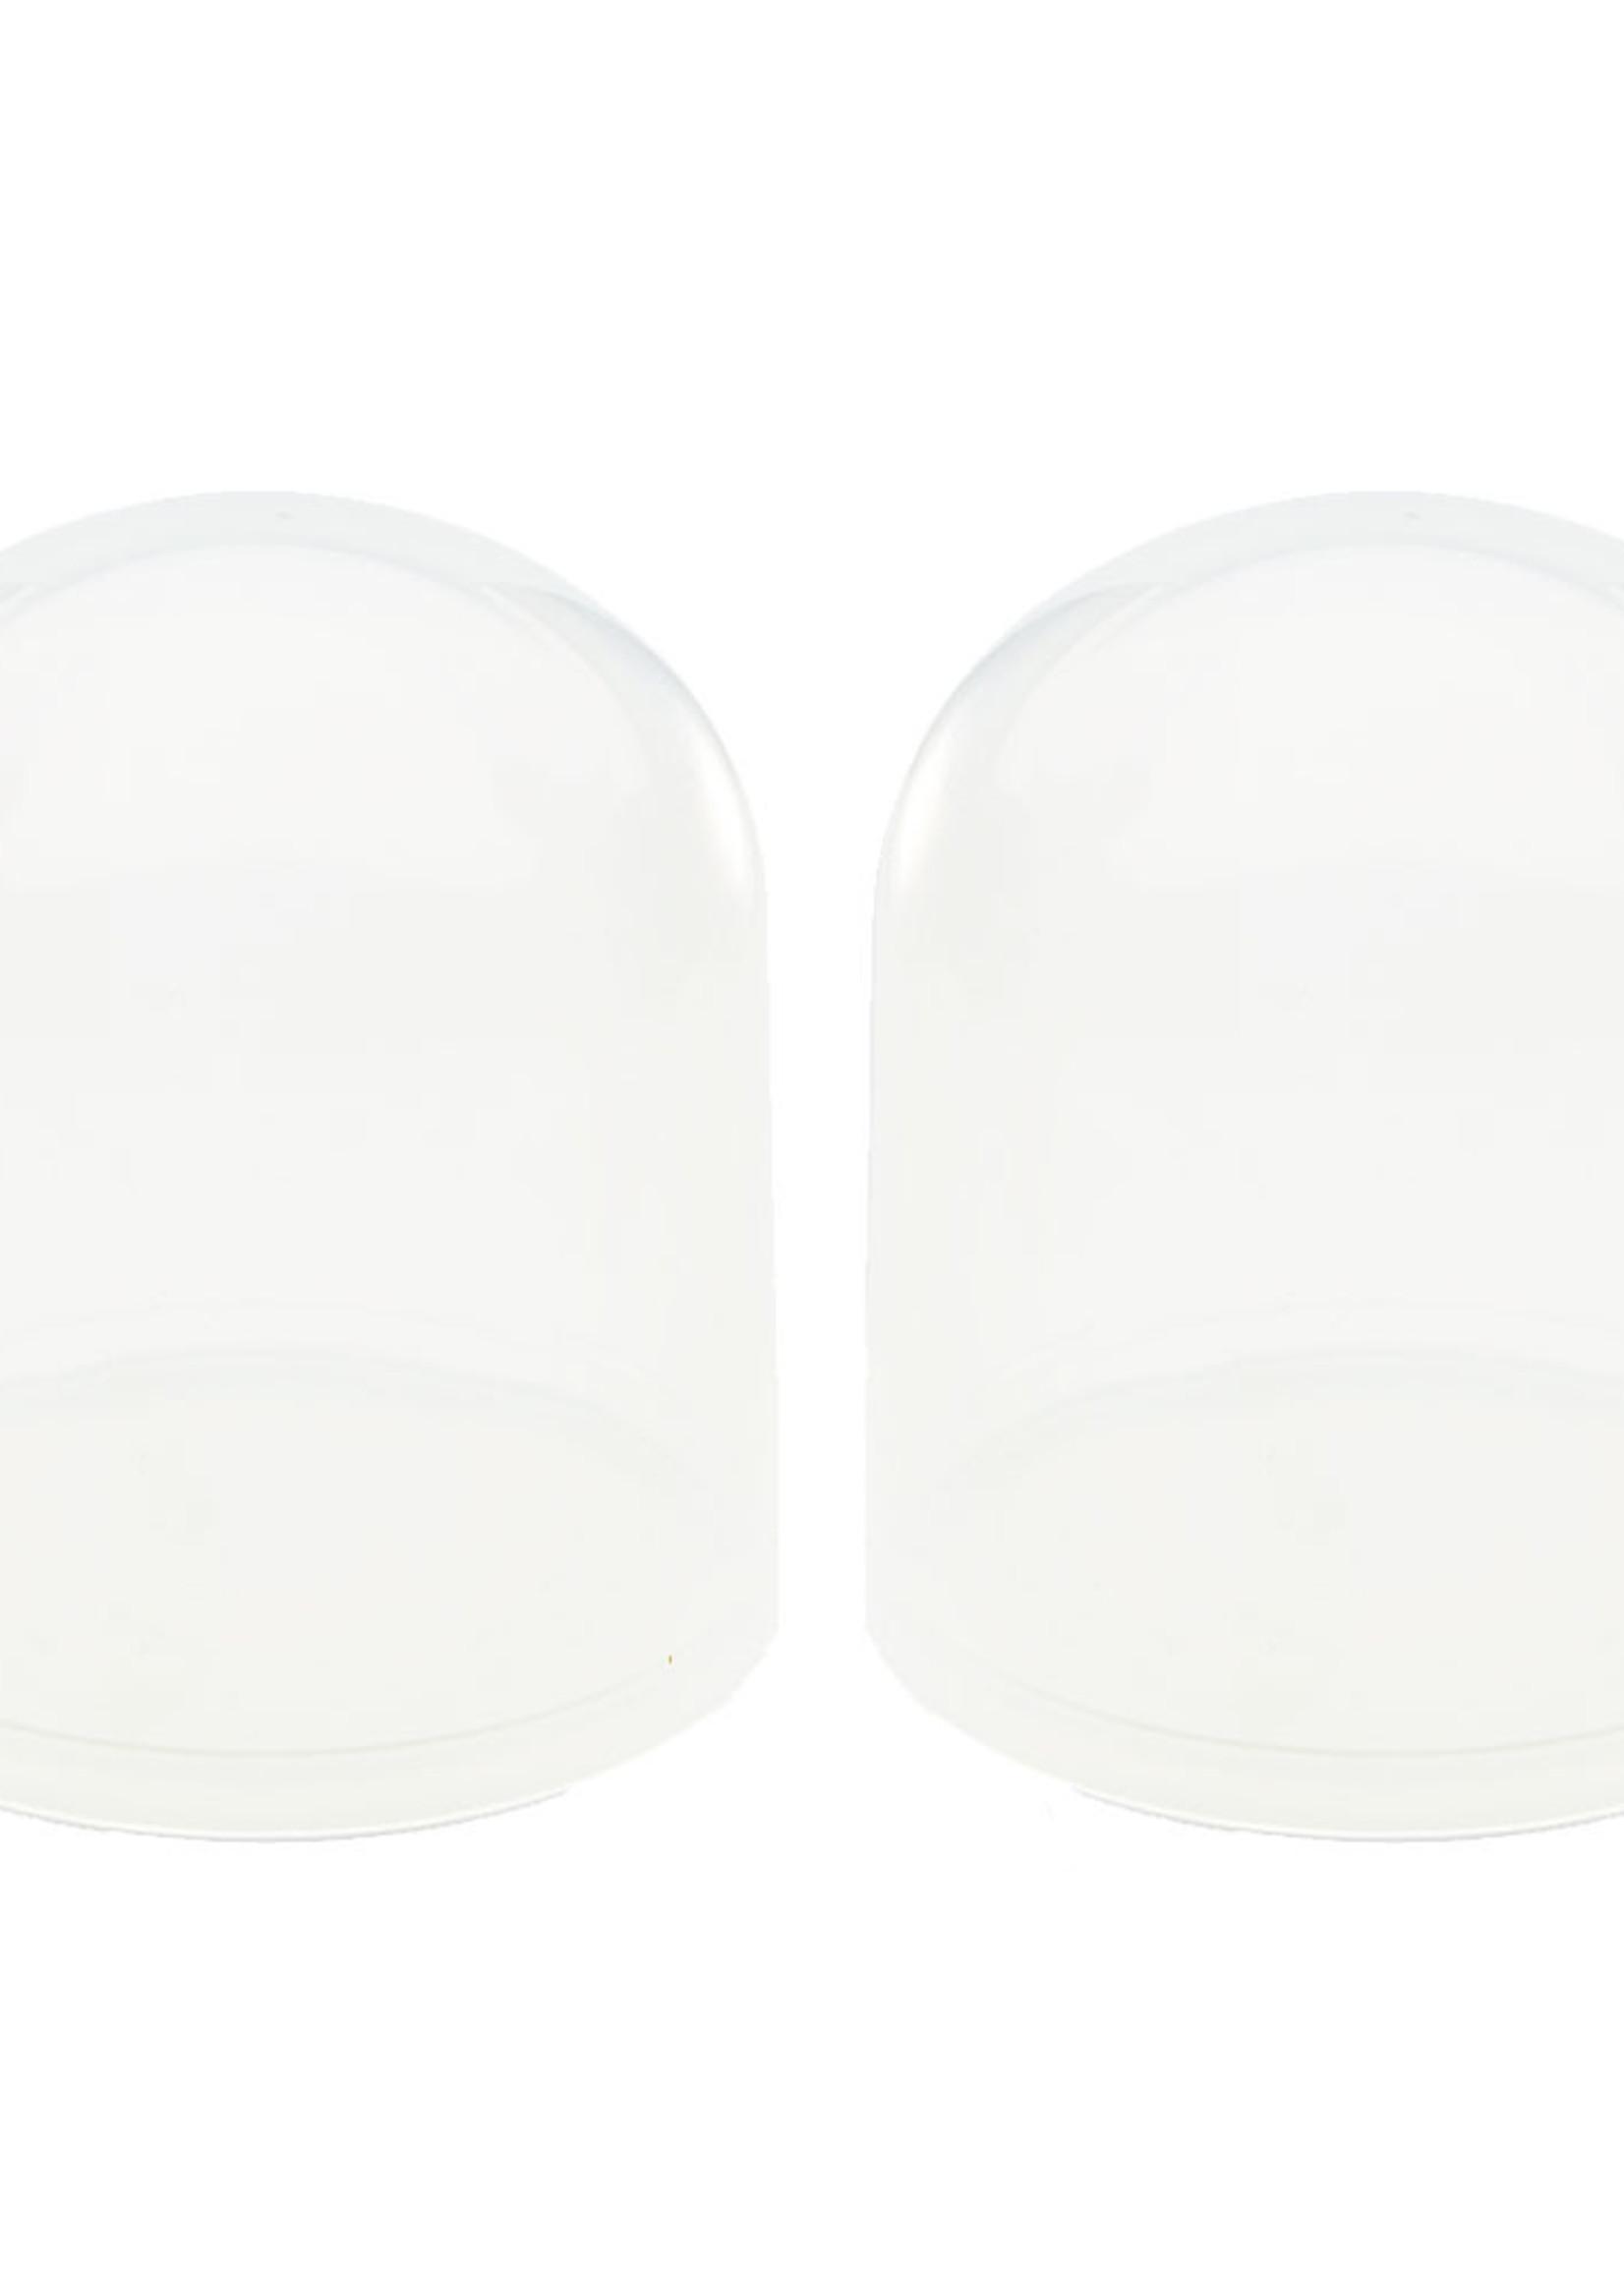 Natursutten Set of 2 Caps